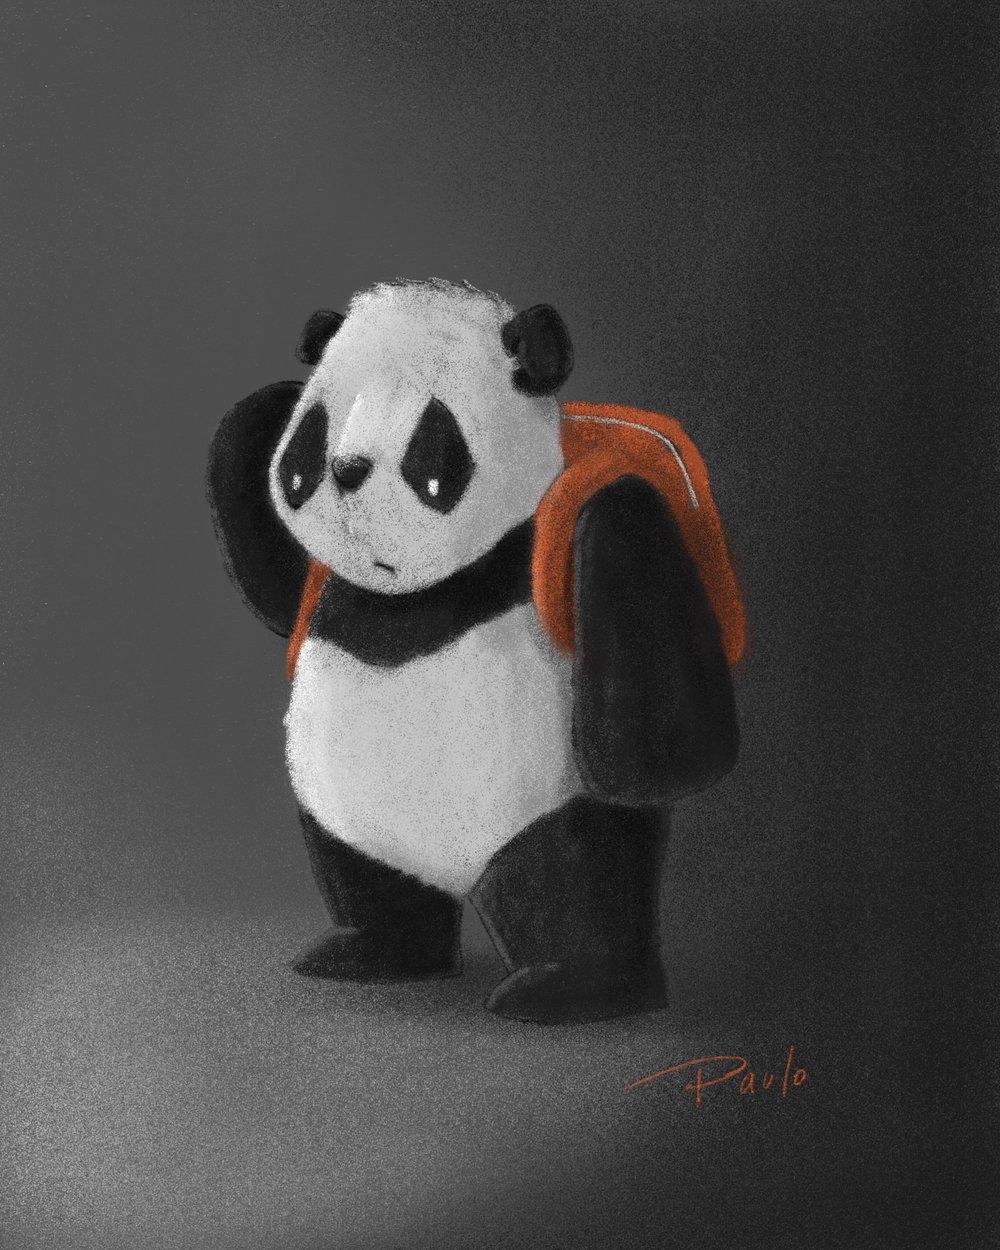 El panda Bei